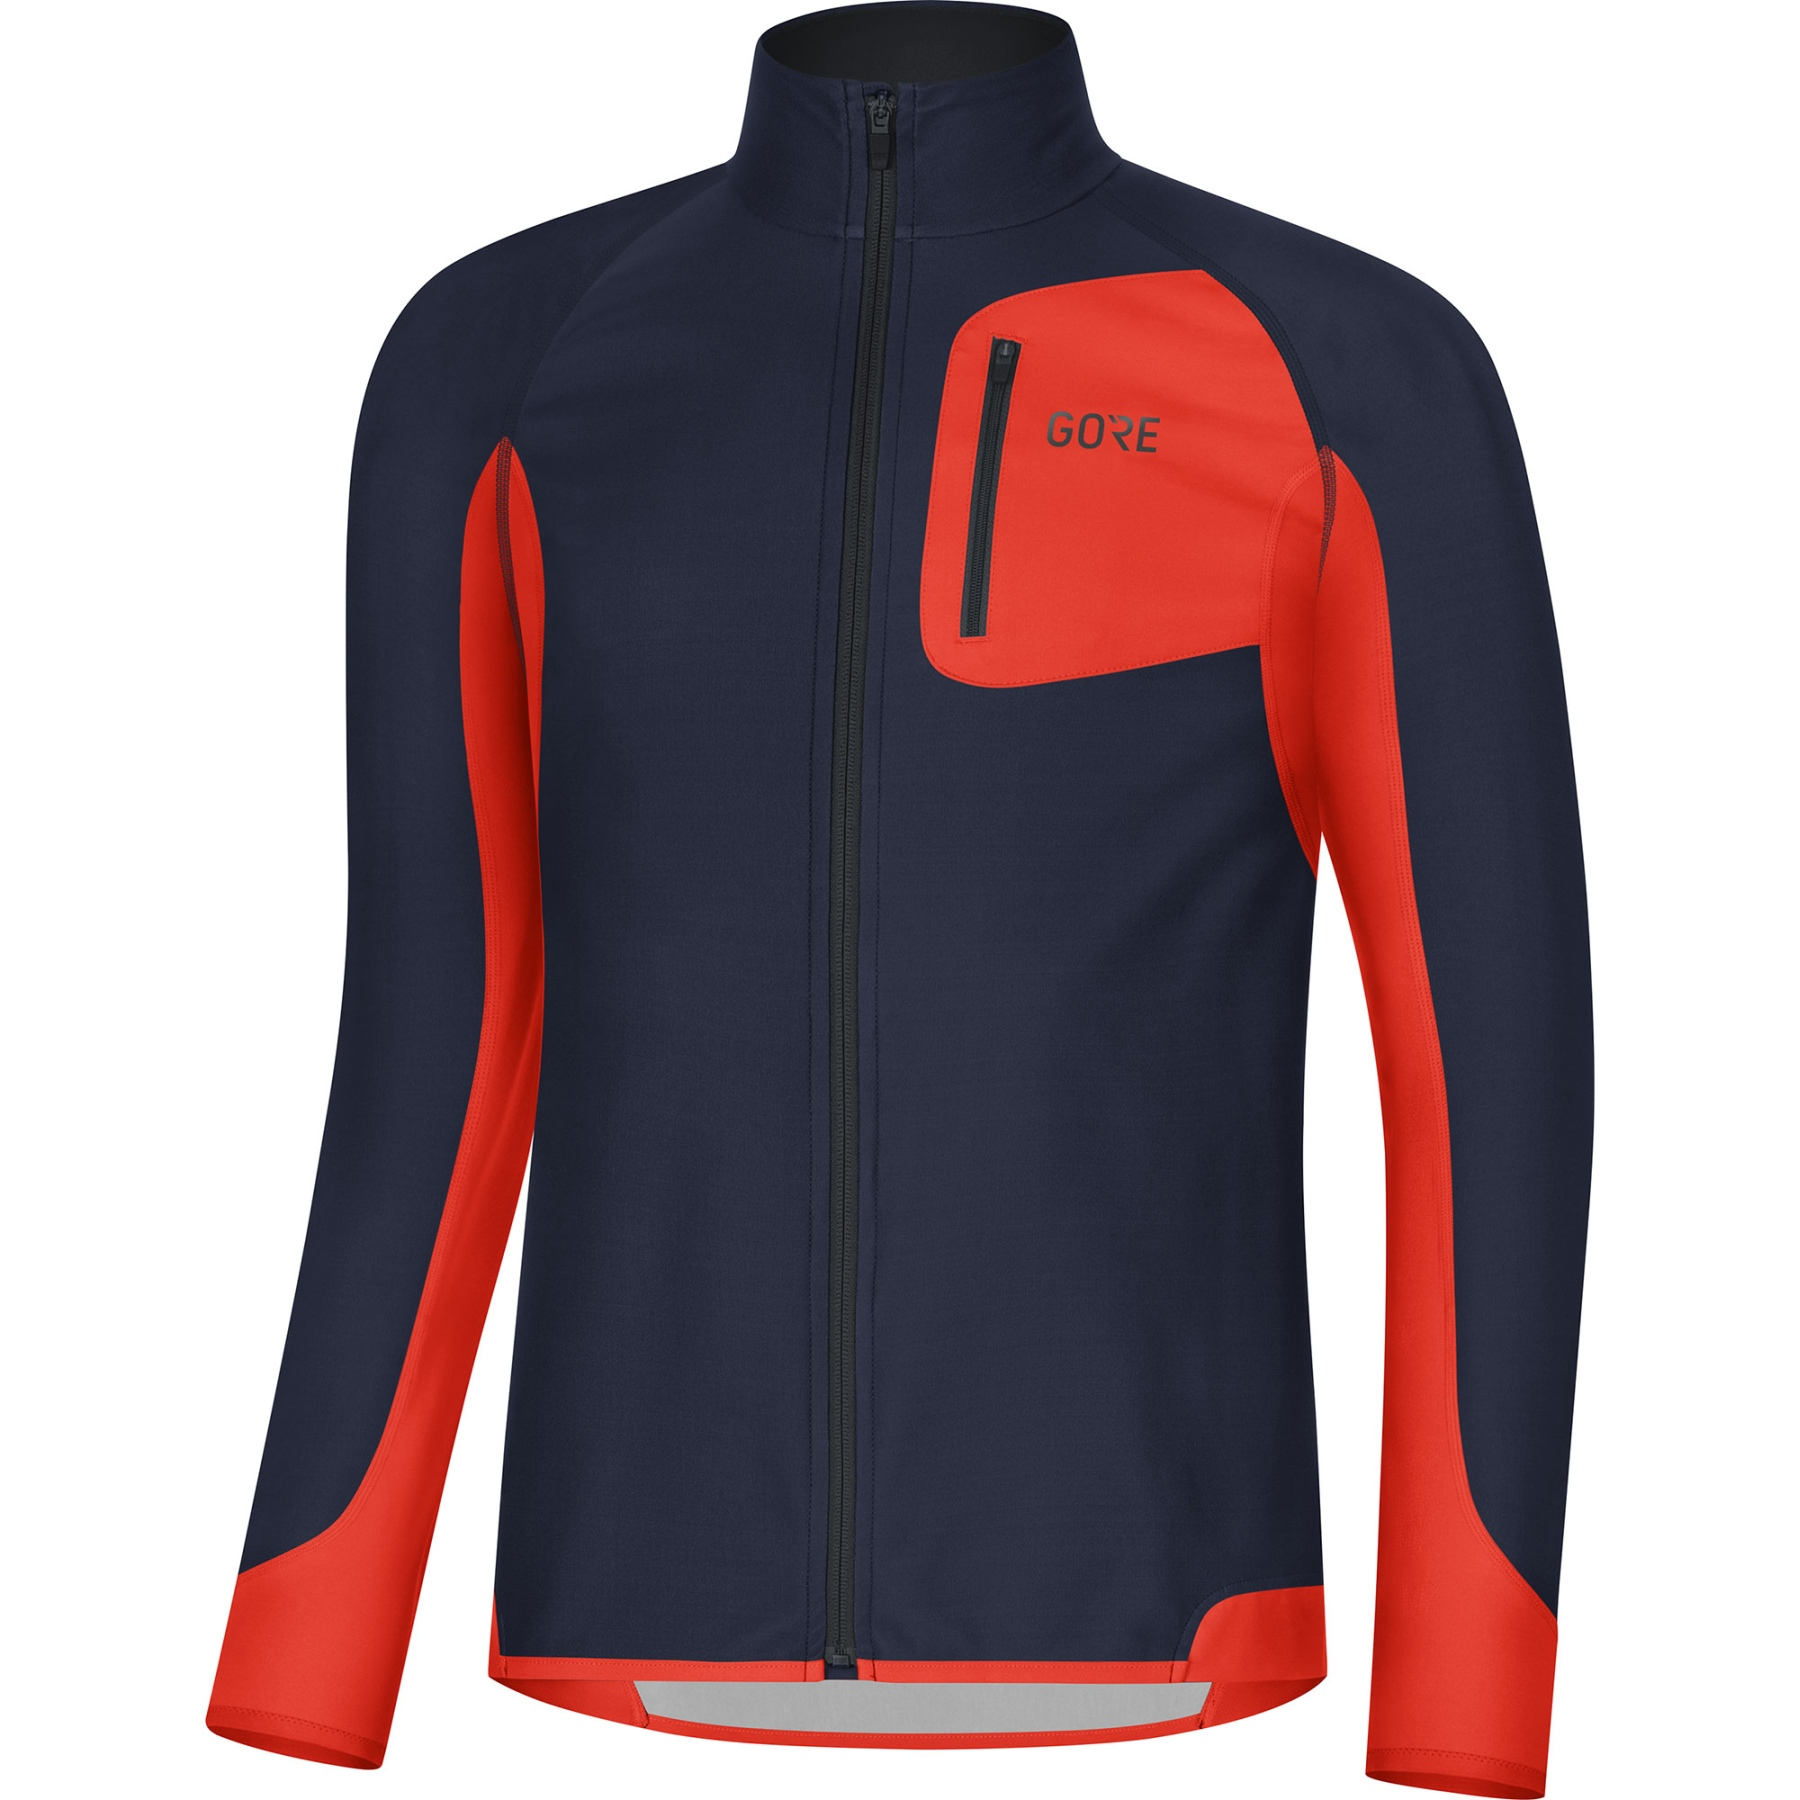 Produktbild von GORE Wear R3 Partial GORE® WINDSTOPPER® Shirt - orbit blue/fireball AUAY